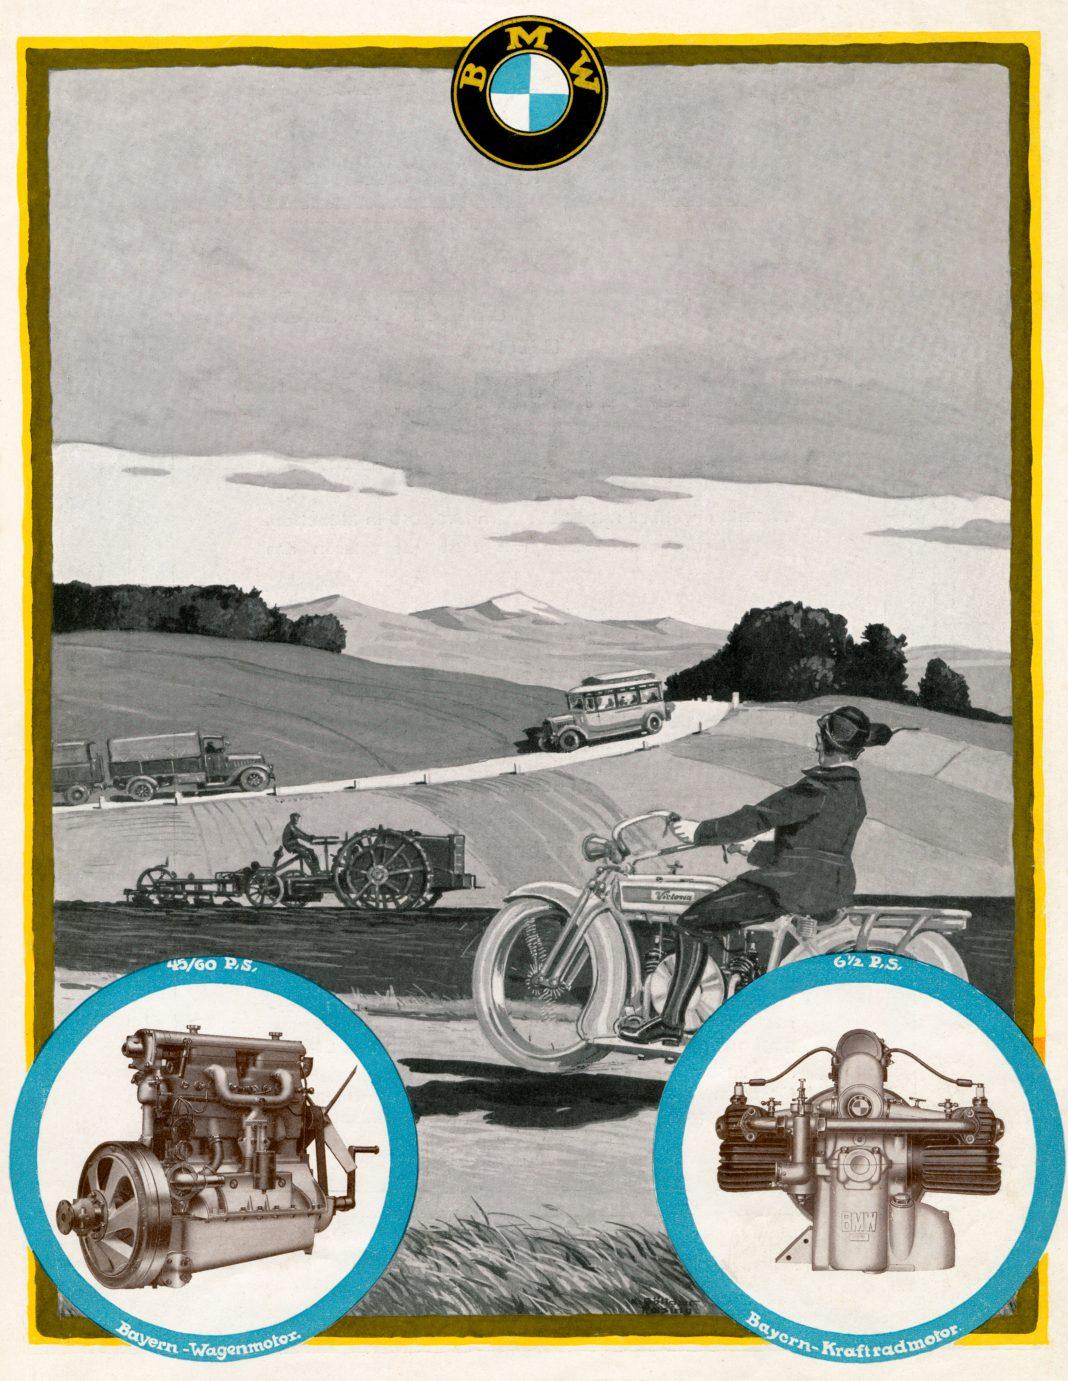 istorie-1-1068x1381 Istorie: 100 de ani de motoare boxer BMW